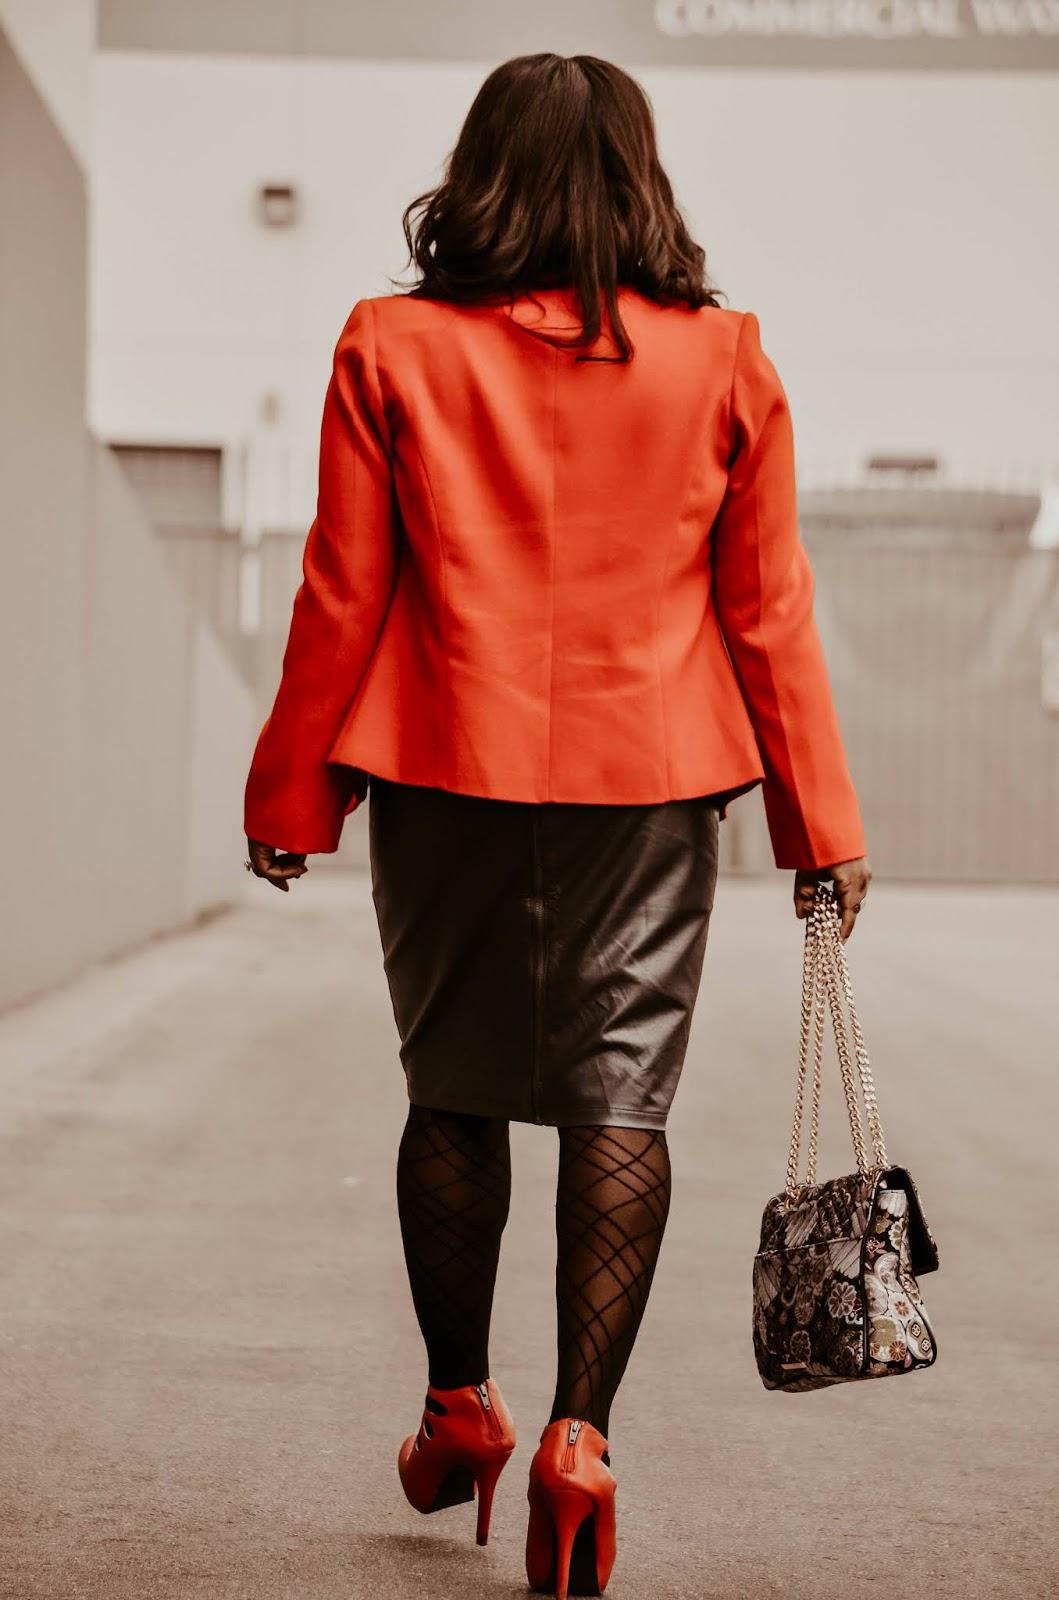 red-fendi-jacket-blazer-leather-skirt-stevemadden-floral-brocade-bag-heels-red-pumps-desert-photoshoot